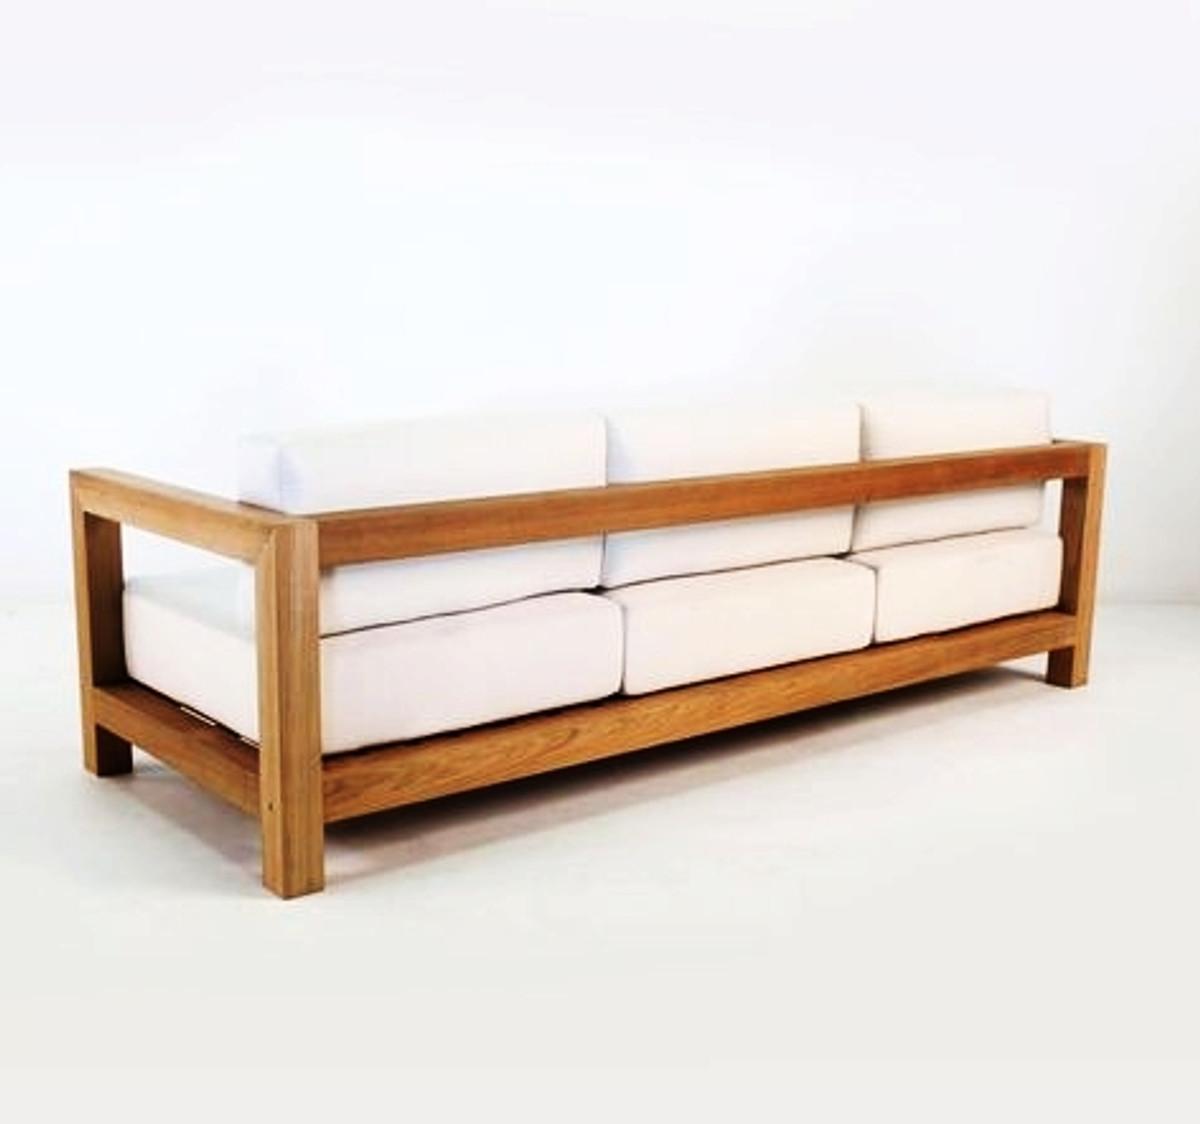 Casa padrino garden 3 seater sofa boston rustic white for Sofa rustikal